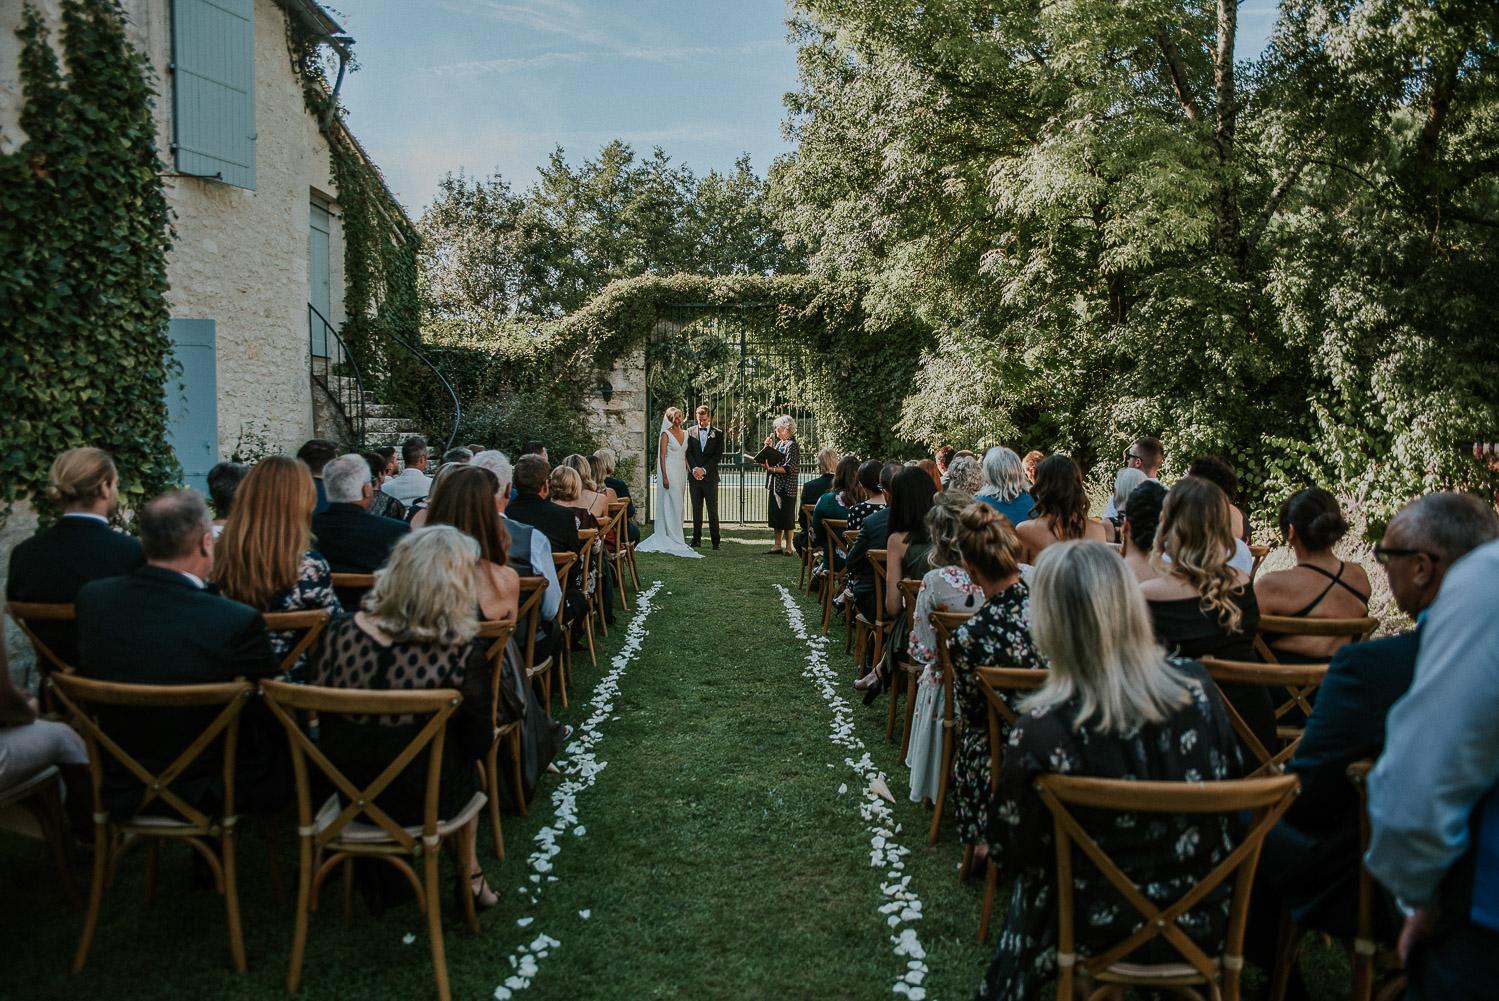 dordogne_eymet_wedding_france_katy_webb_photography_france_UK50